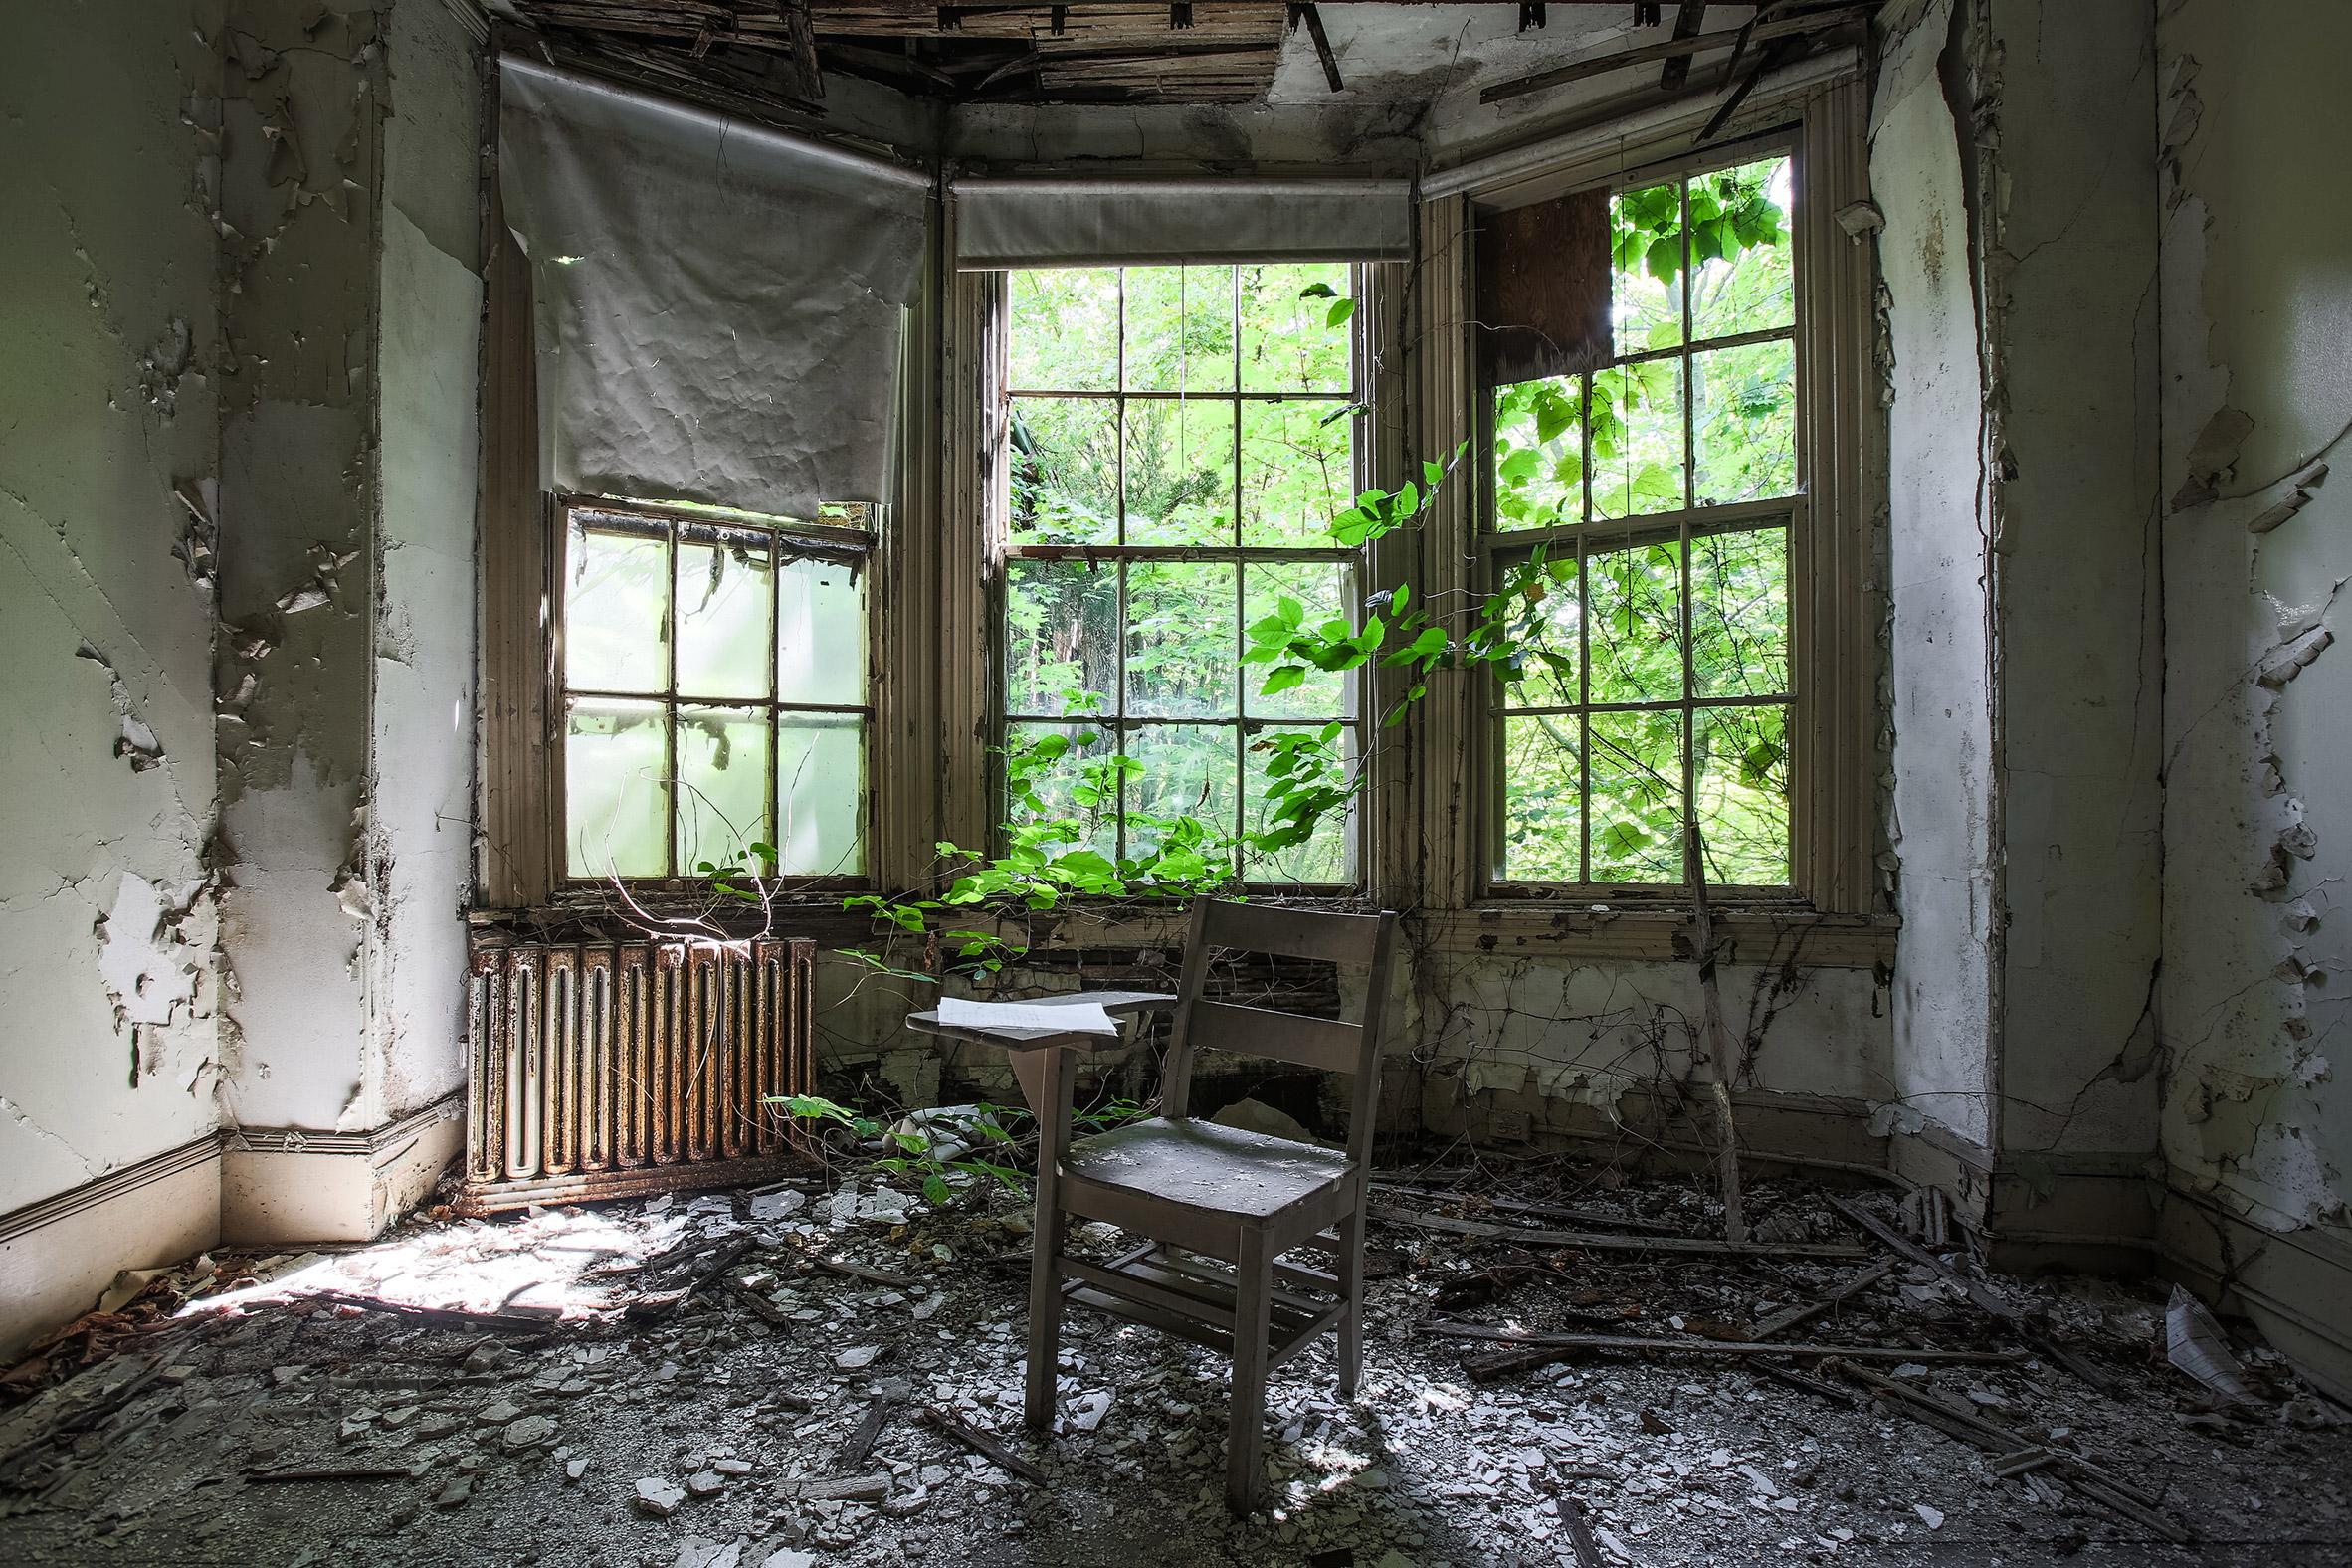 Abandoned-Asylums-7.jpg